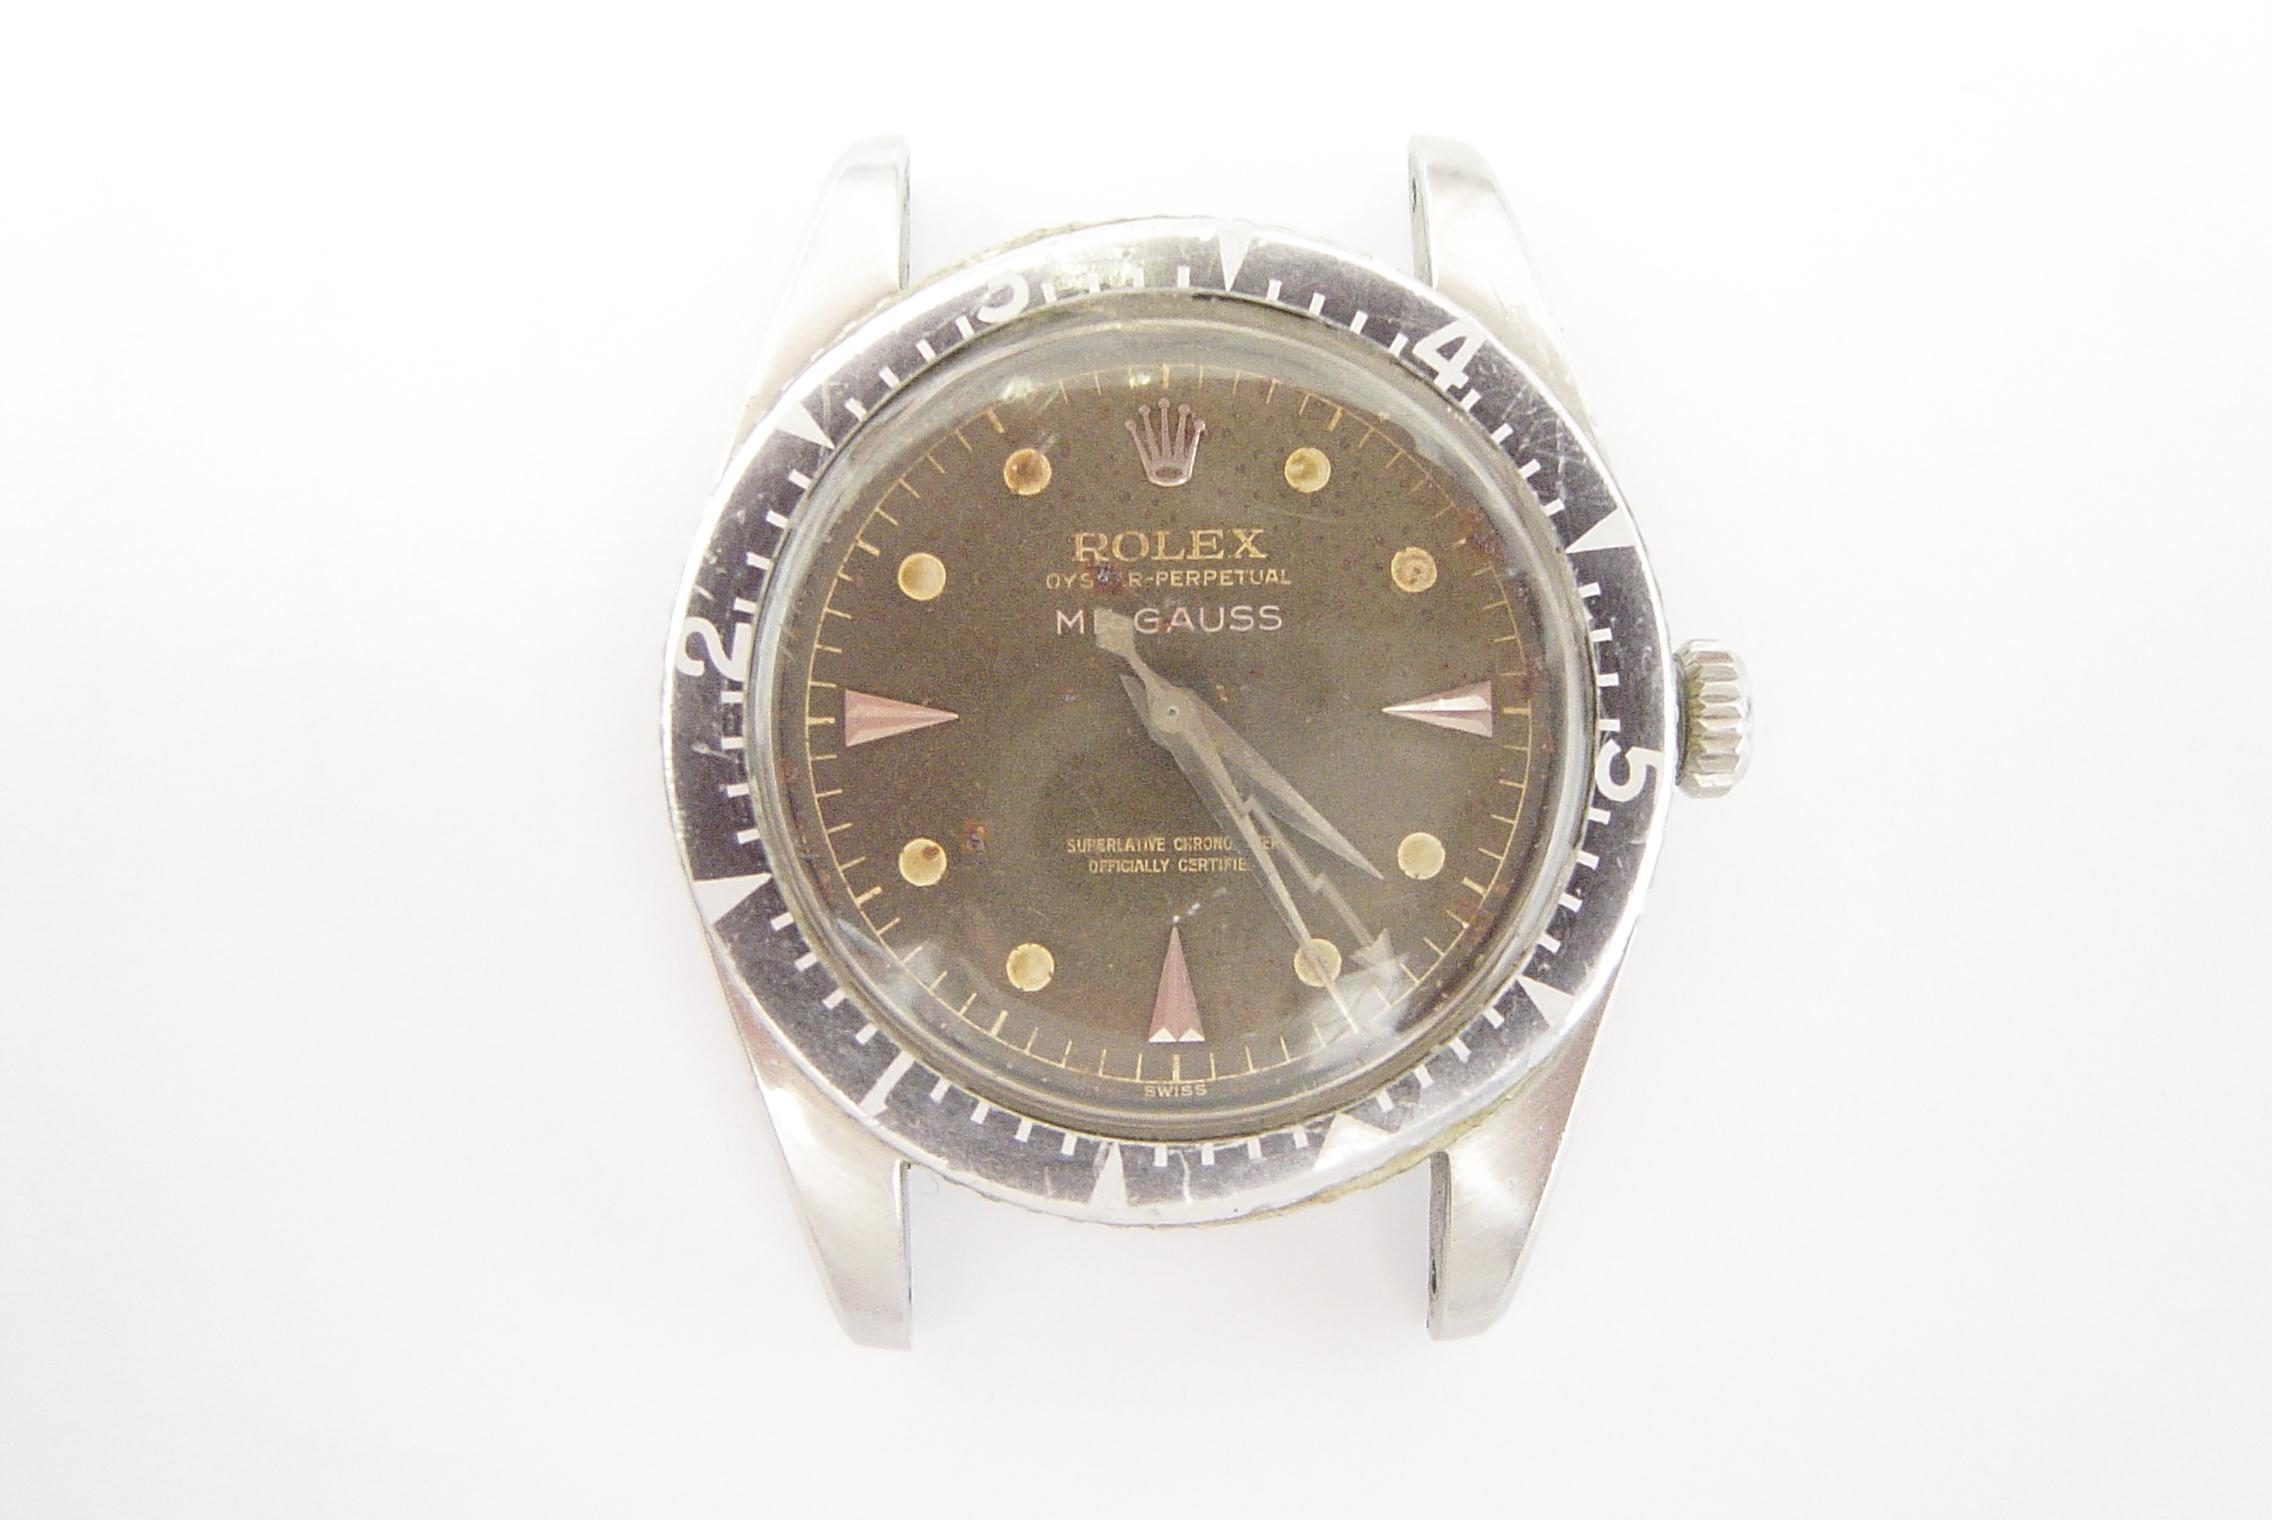 1958 Rolex Milgauss